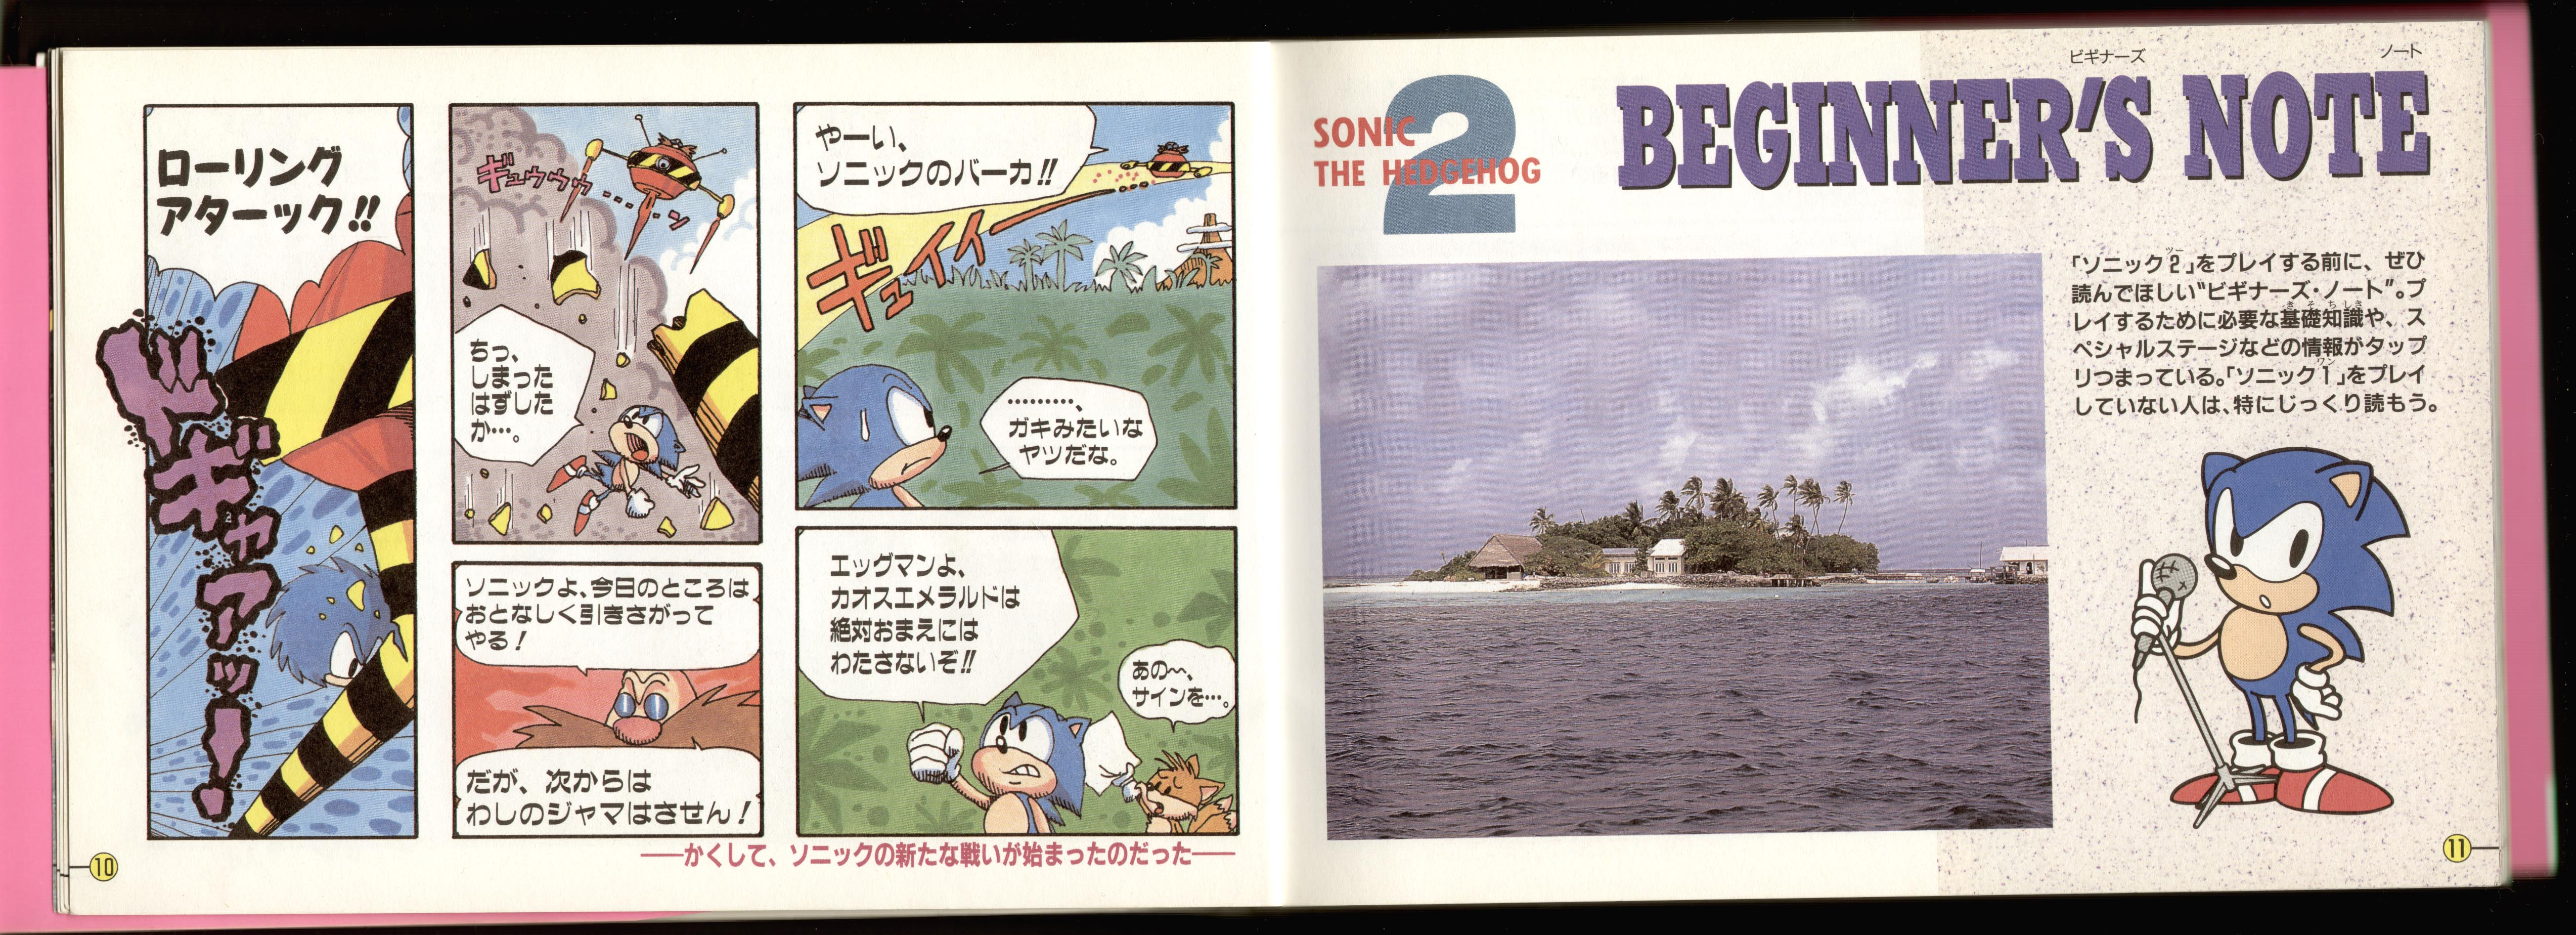 Sonic 2 Manual Art - Pg 04